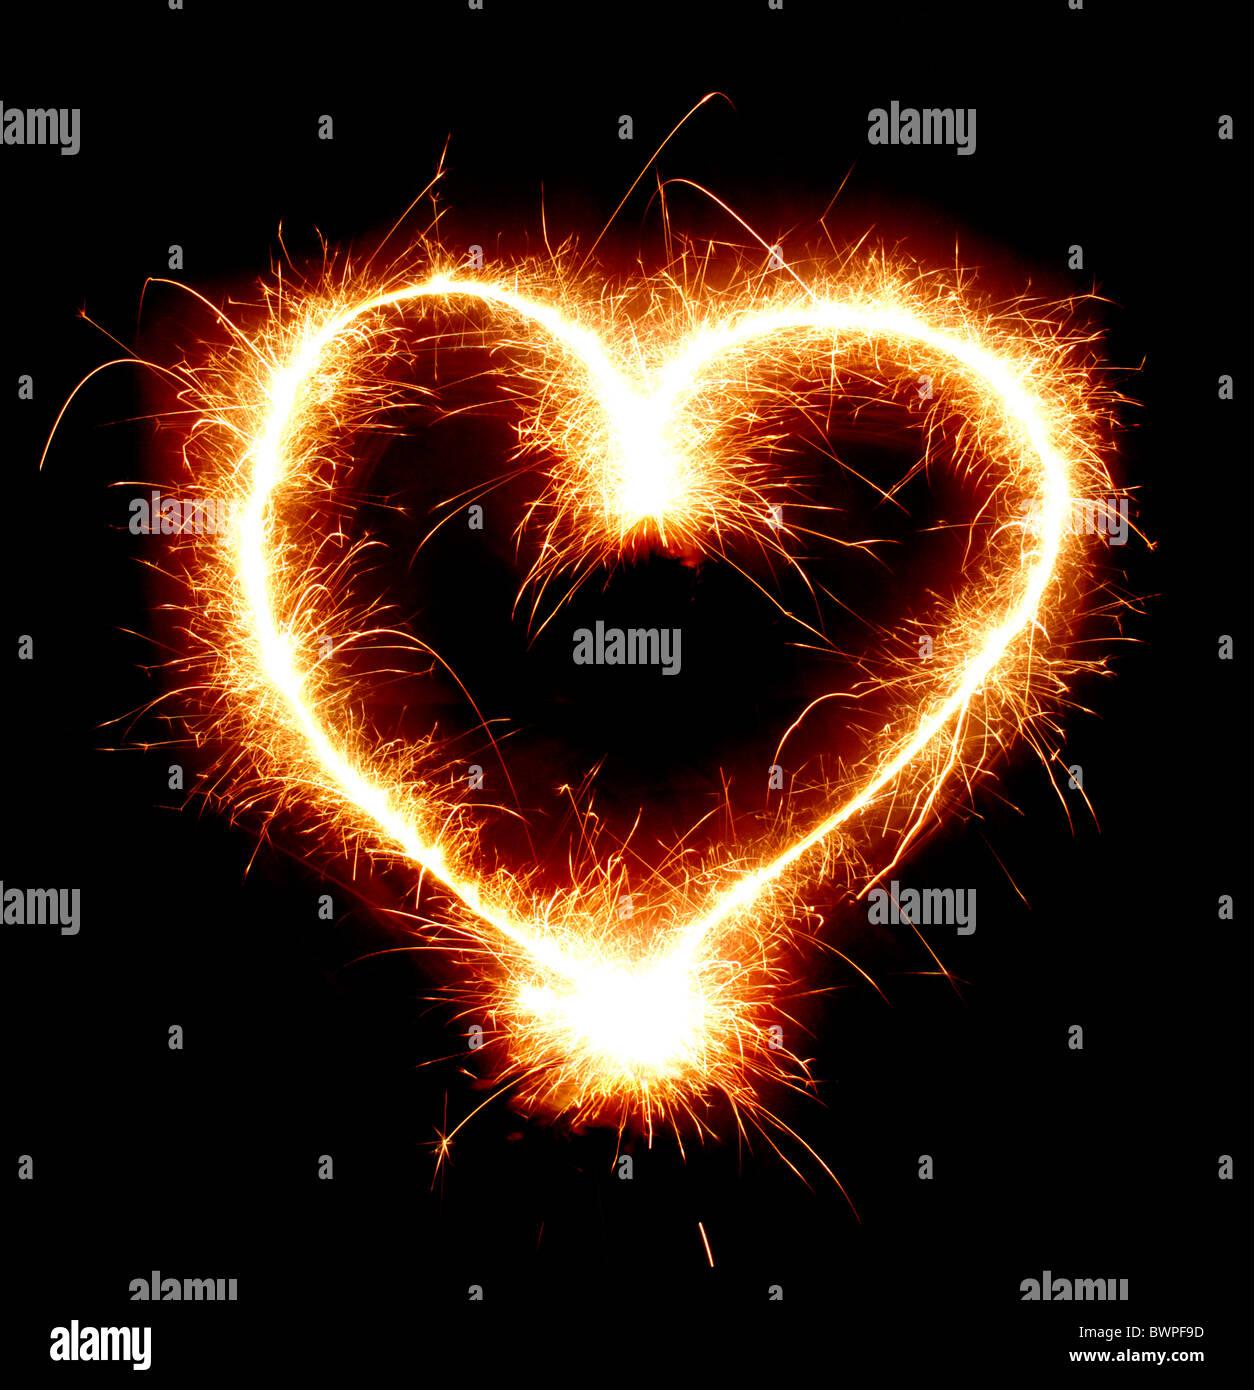 Burning Heart Symbol Heart Shaped Stock Photos Burning Heart